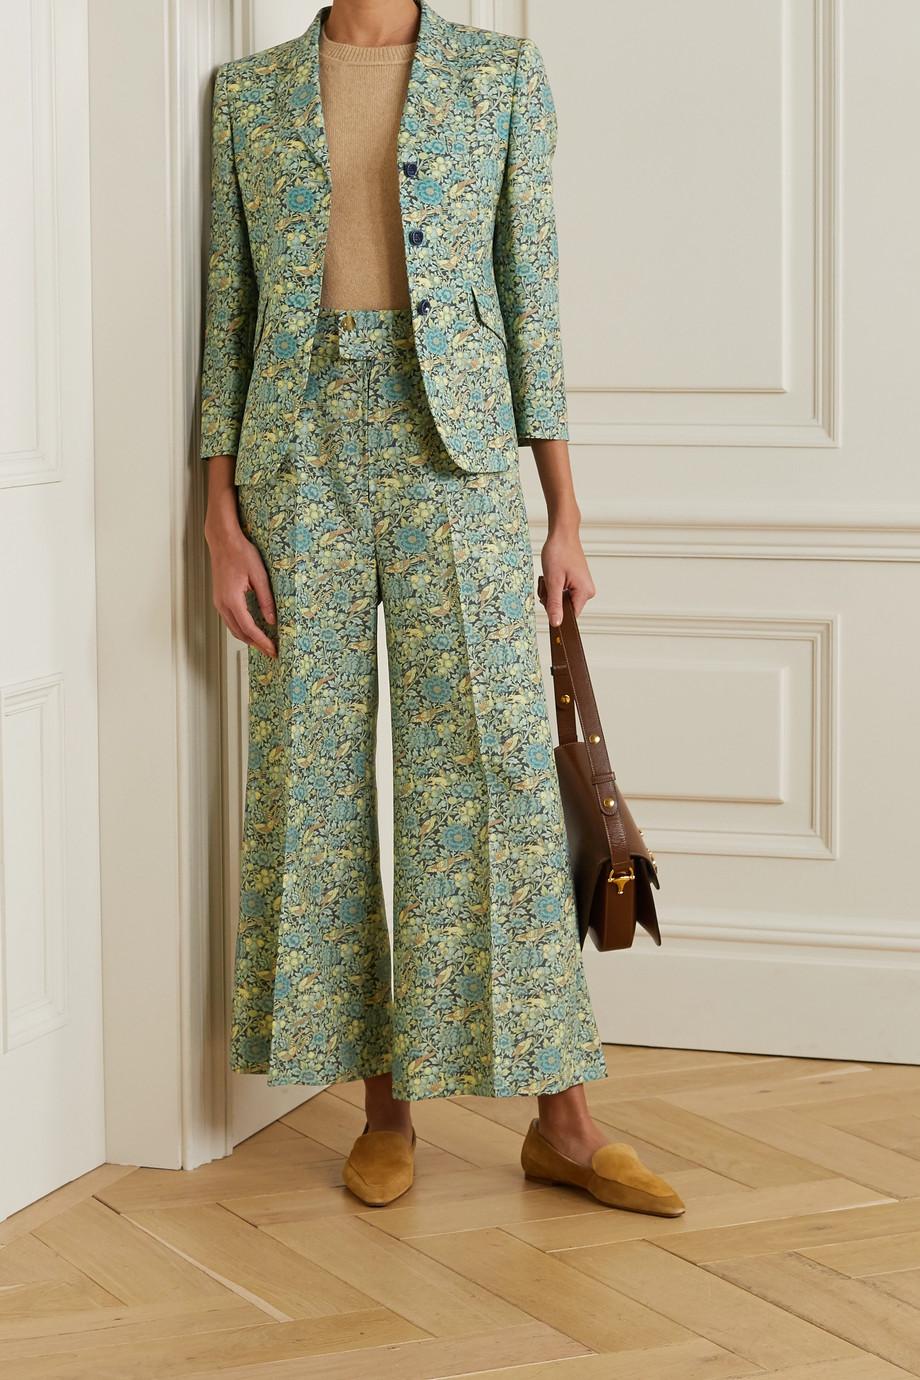 Gucci 花卉印花羊毛马海毛混纺西装外套